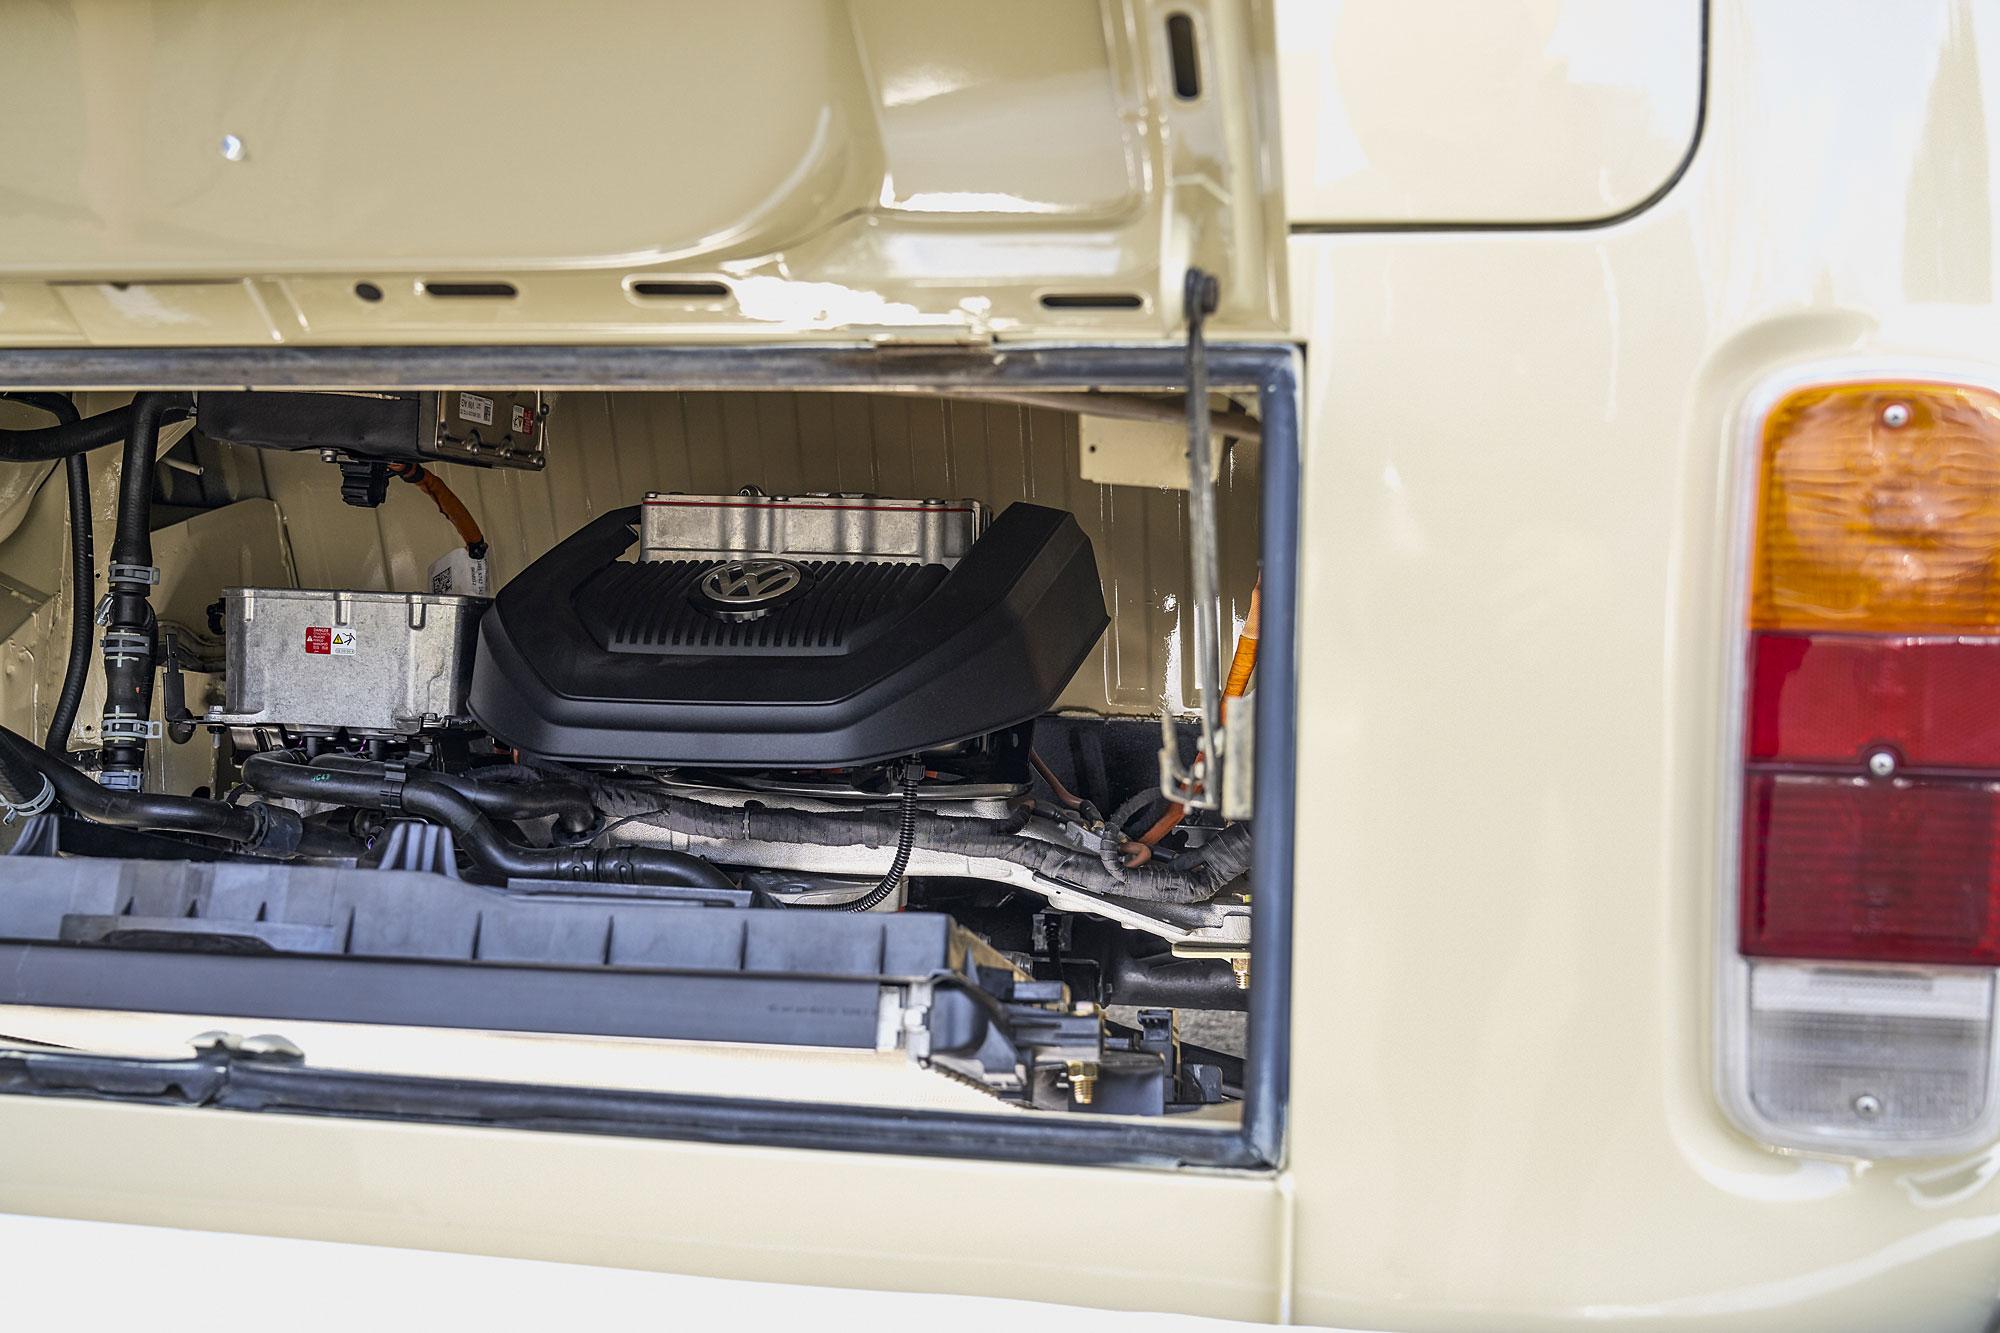 T2 e-Bus 動力系統來自於 2017 年式的 e-Golf 電動車。